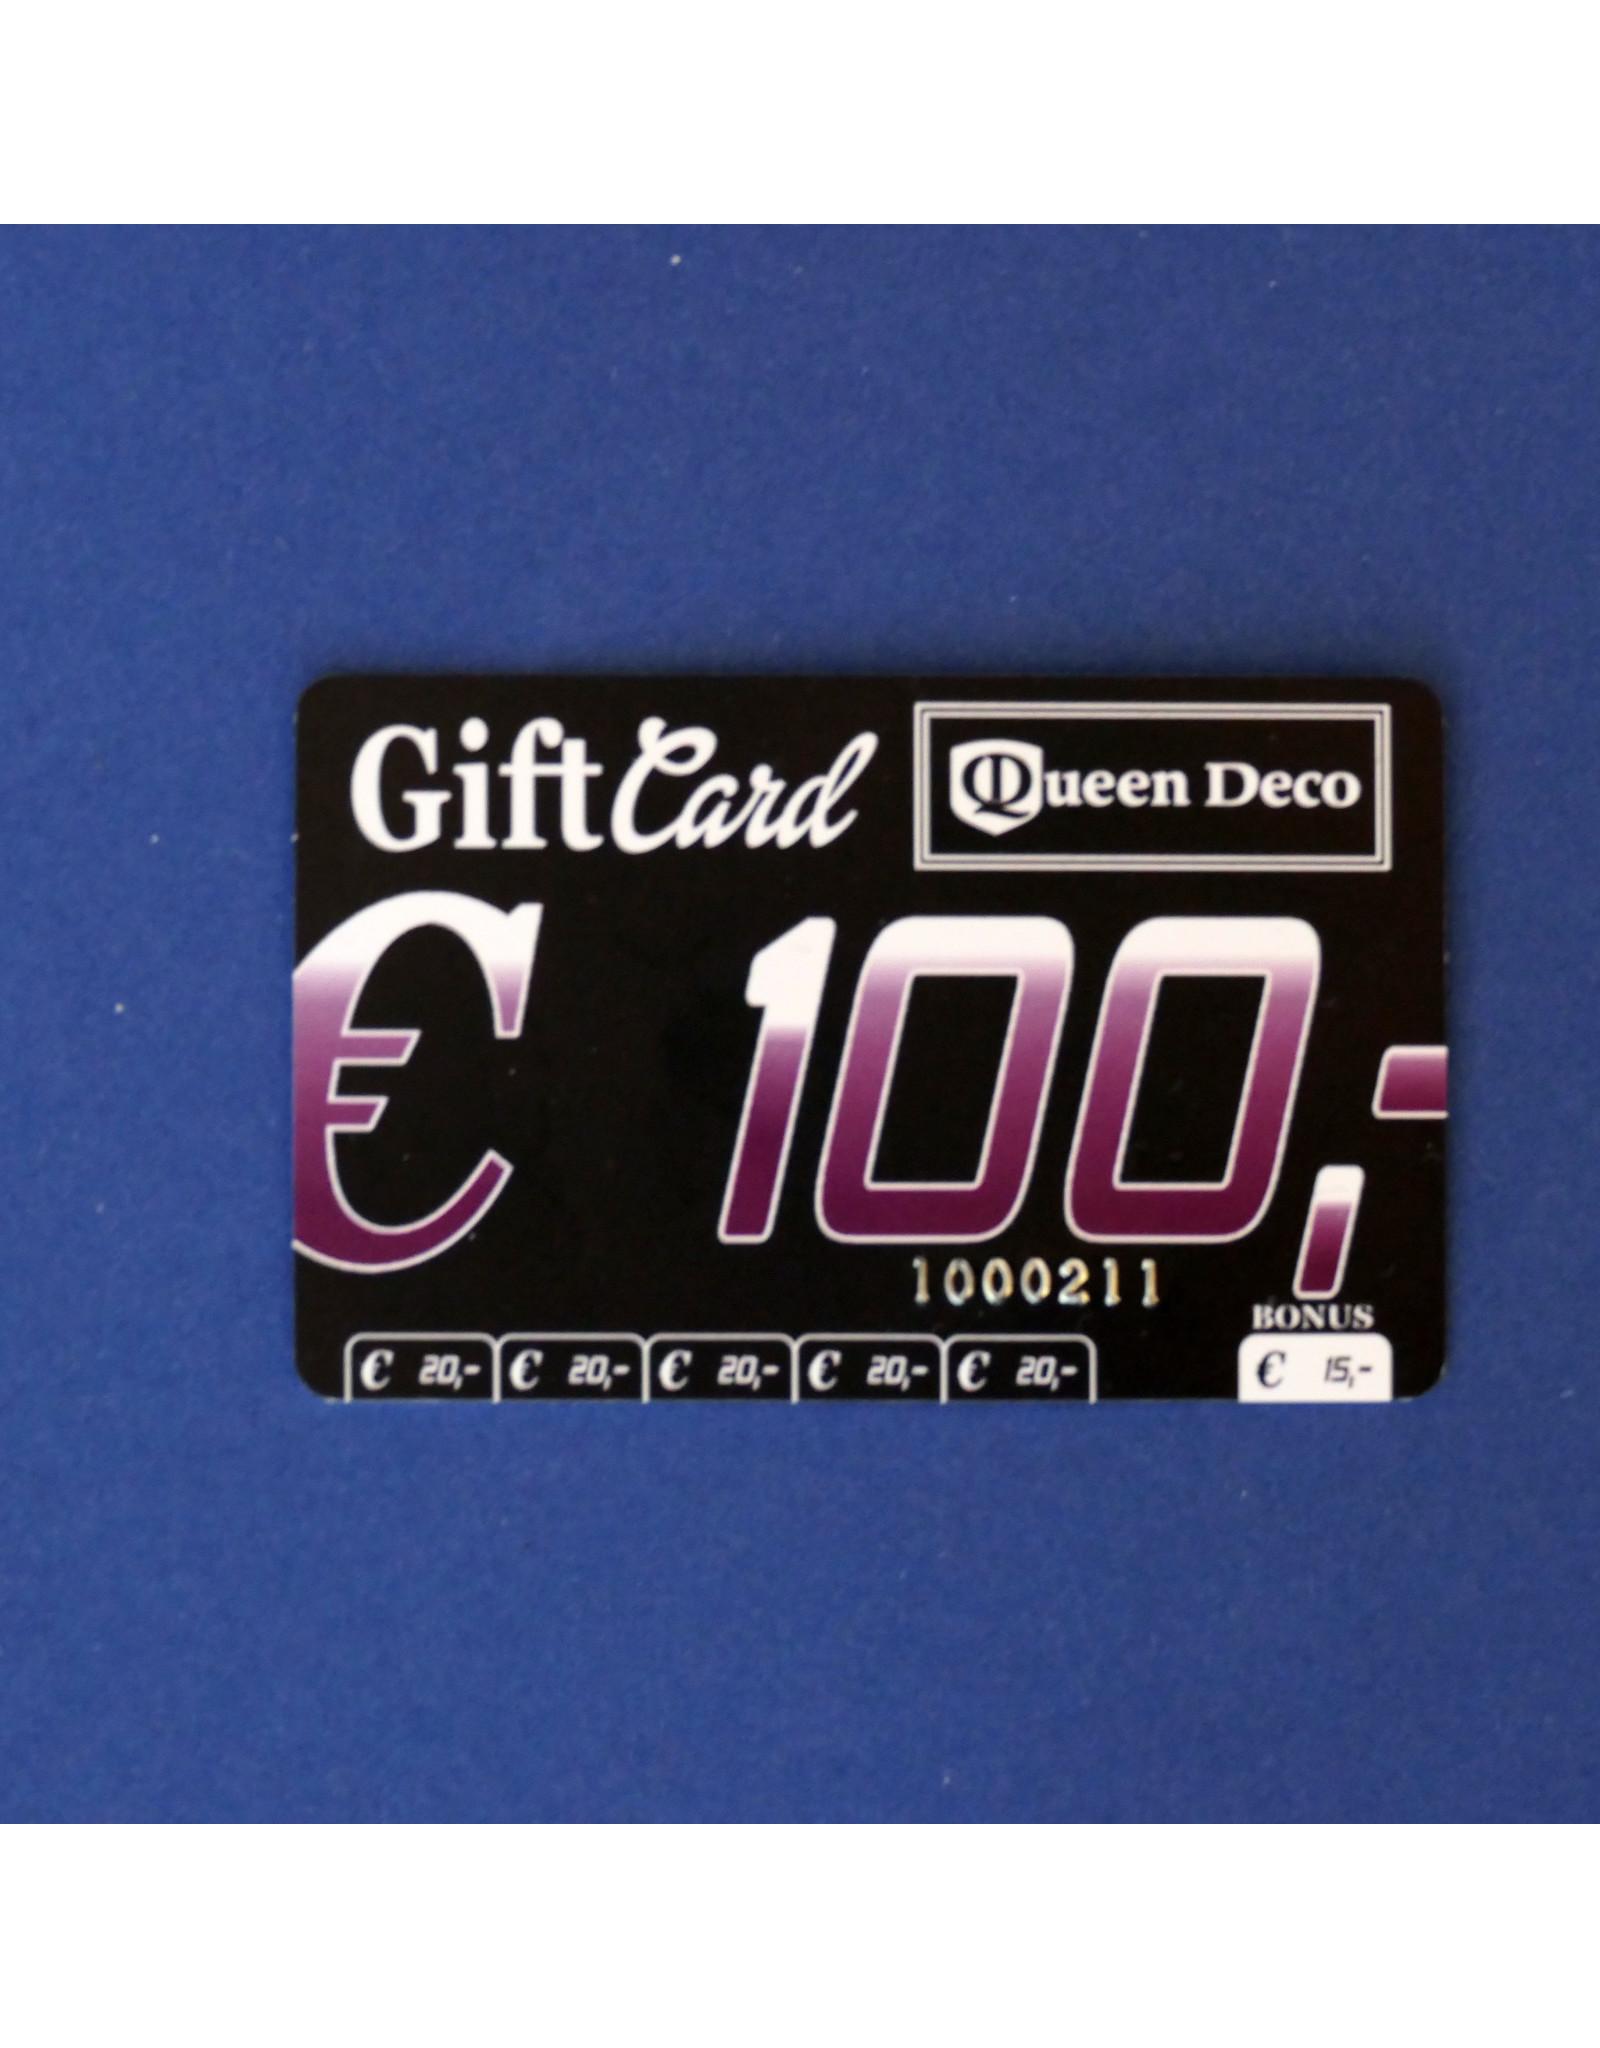 Q&D GIFTCARD CADEAUBON (GIFTCARD) €100.00 HONDERD EURO